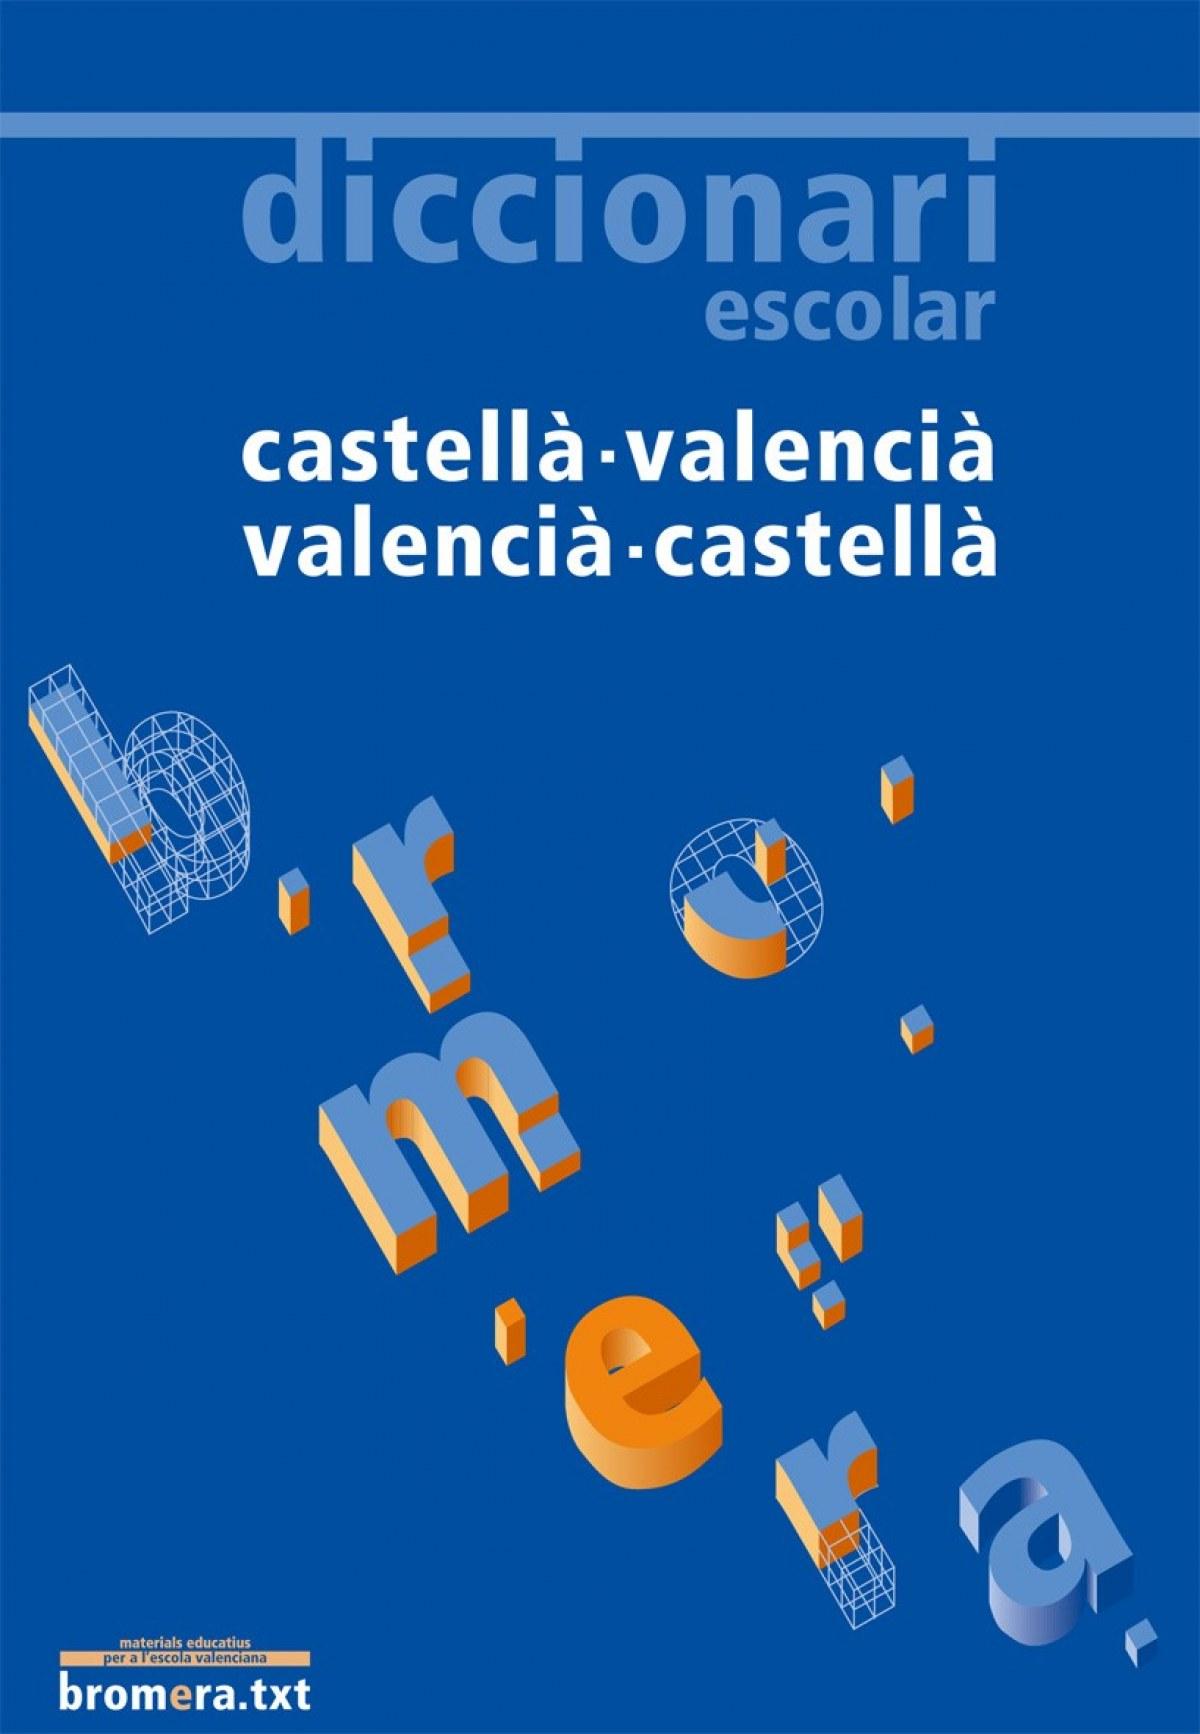 Diccionari escolar castellà - valencià / valencià - castellà 97884982404